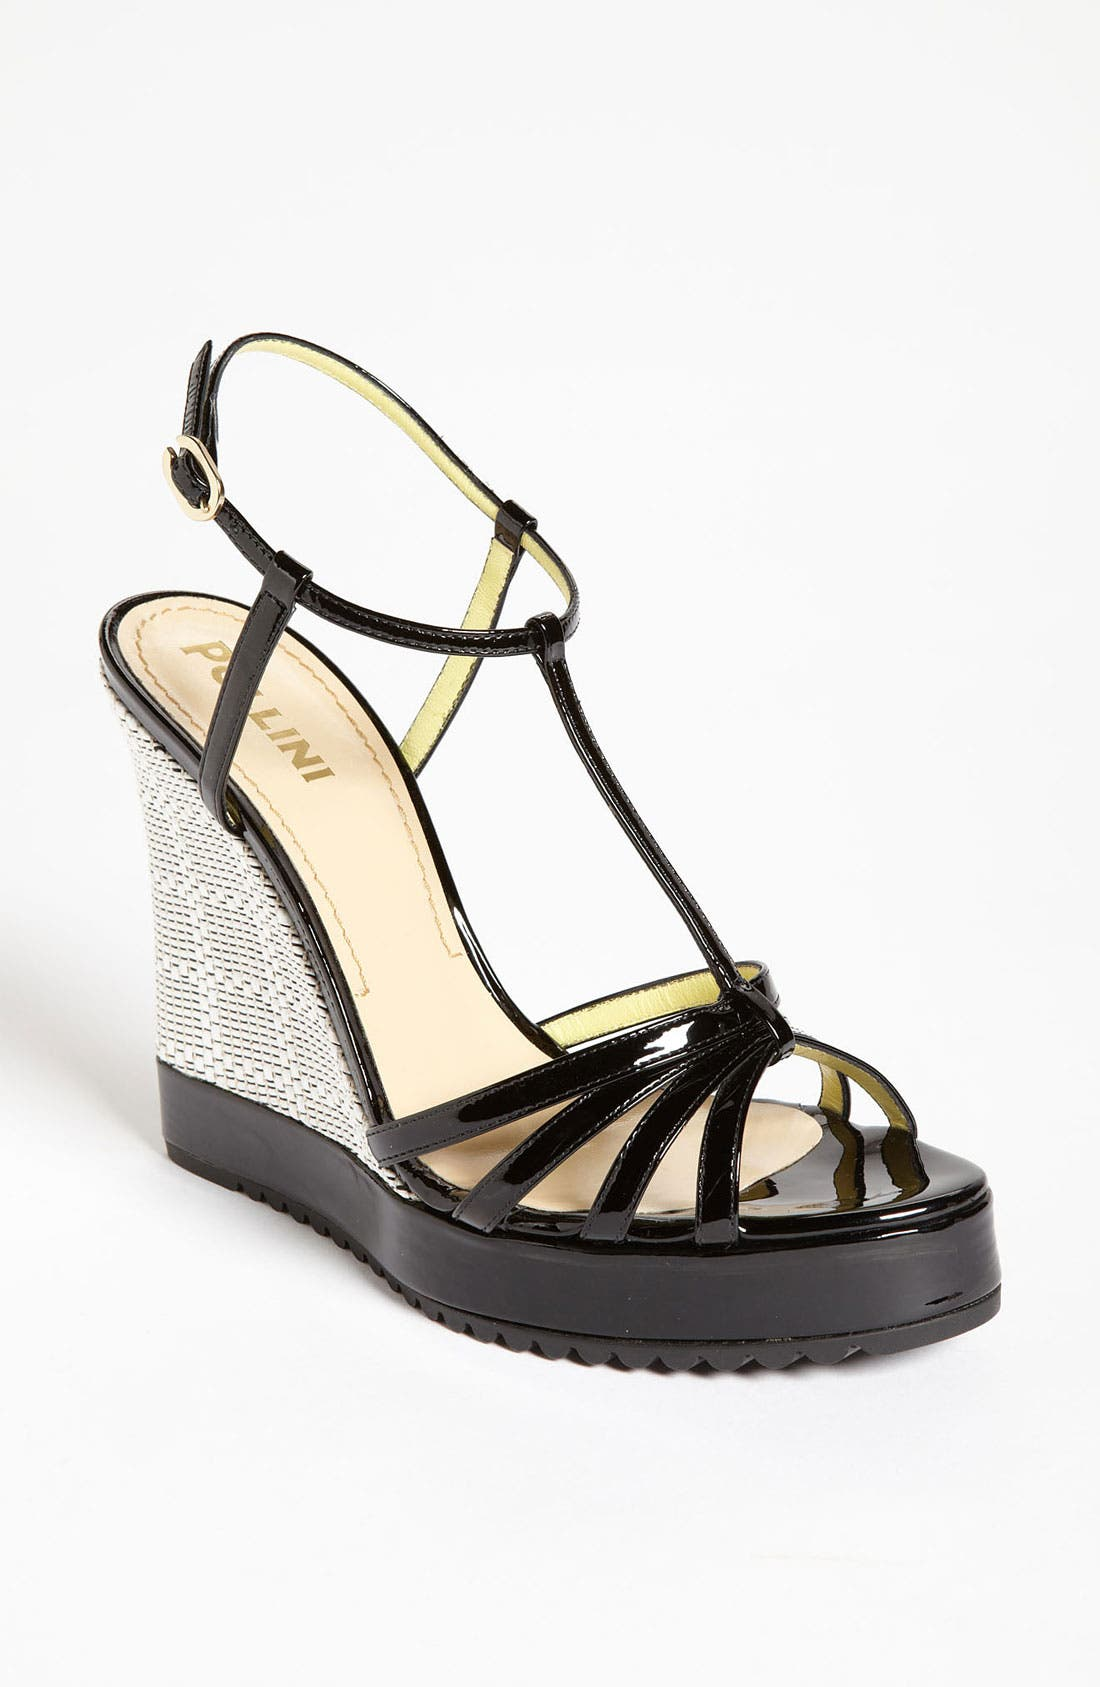 Alternate Image 1 Selected - Pollini Woven Wedge Sandal